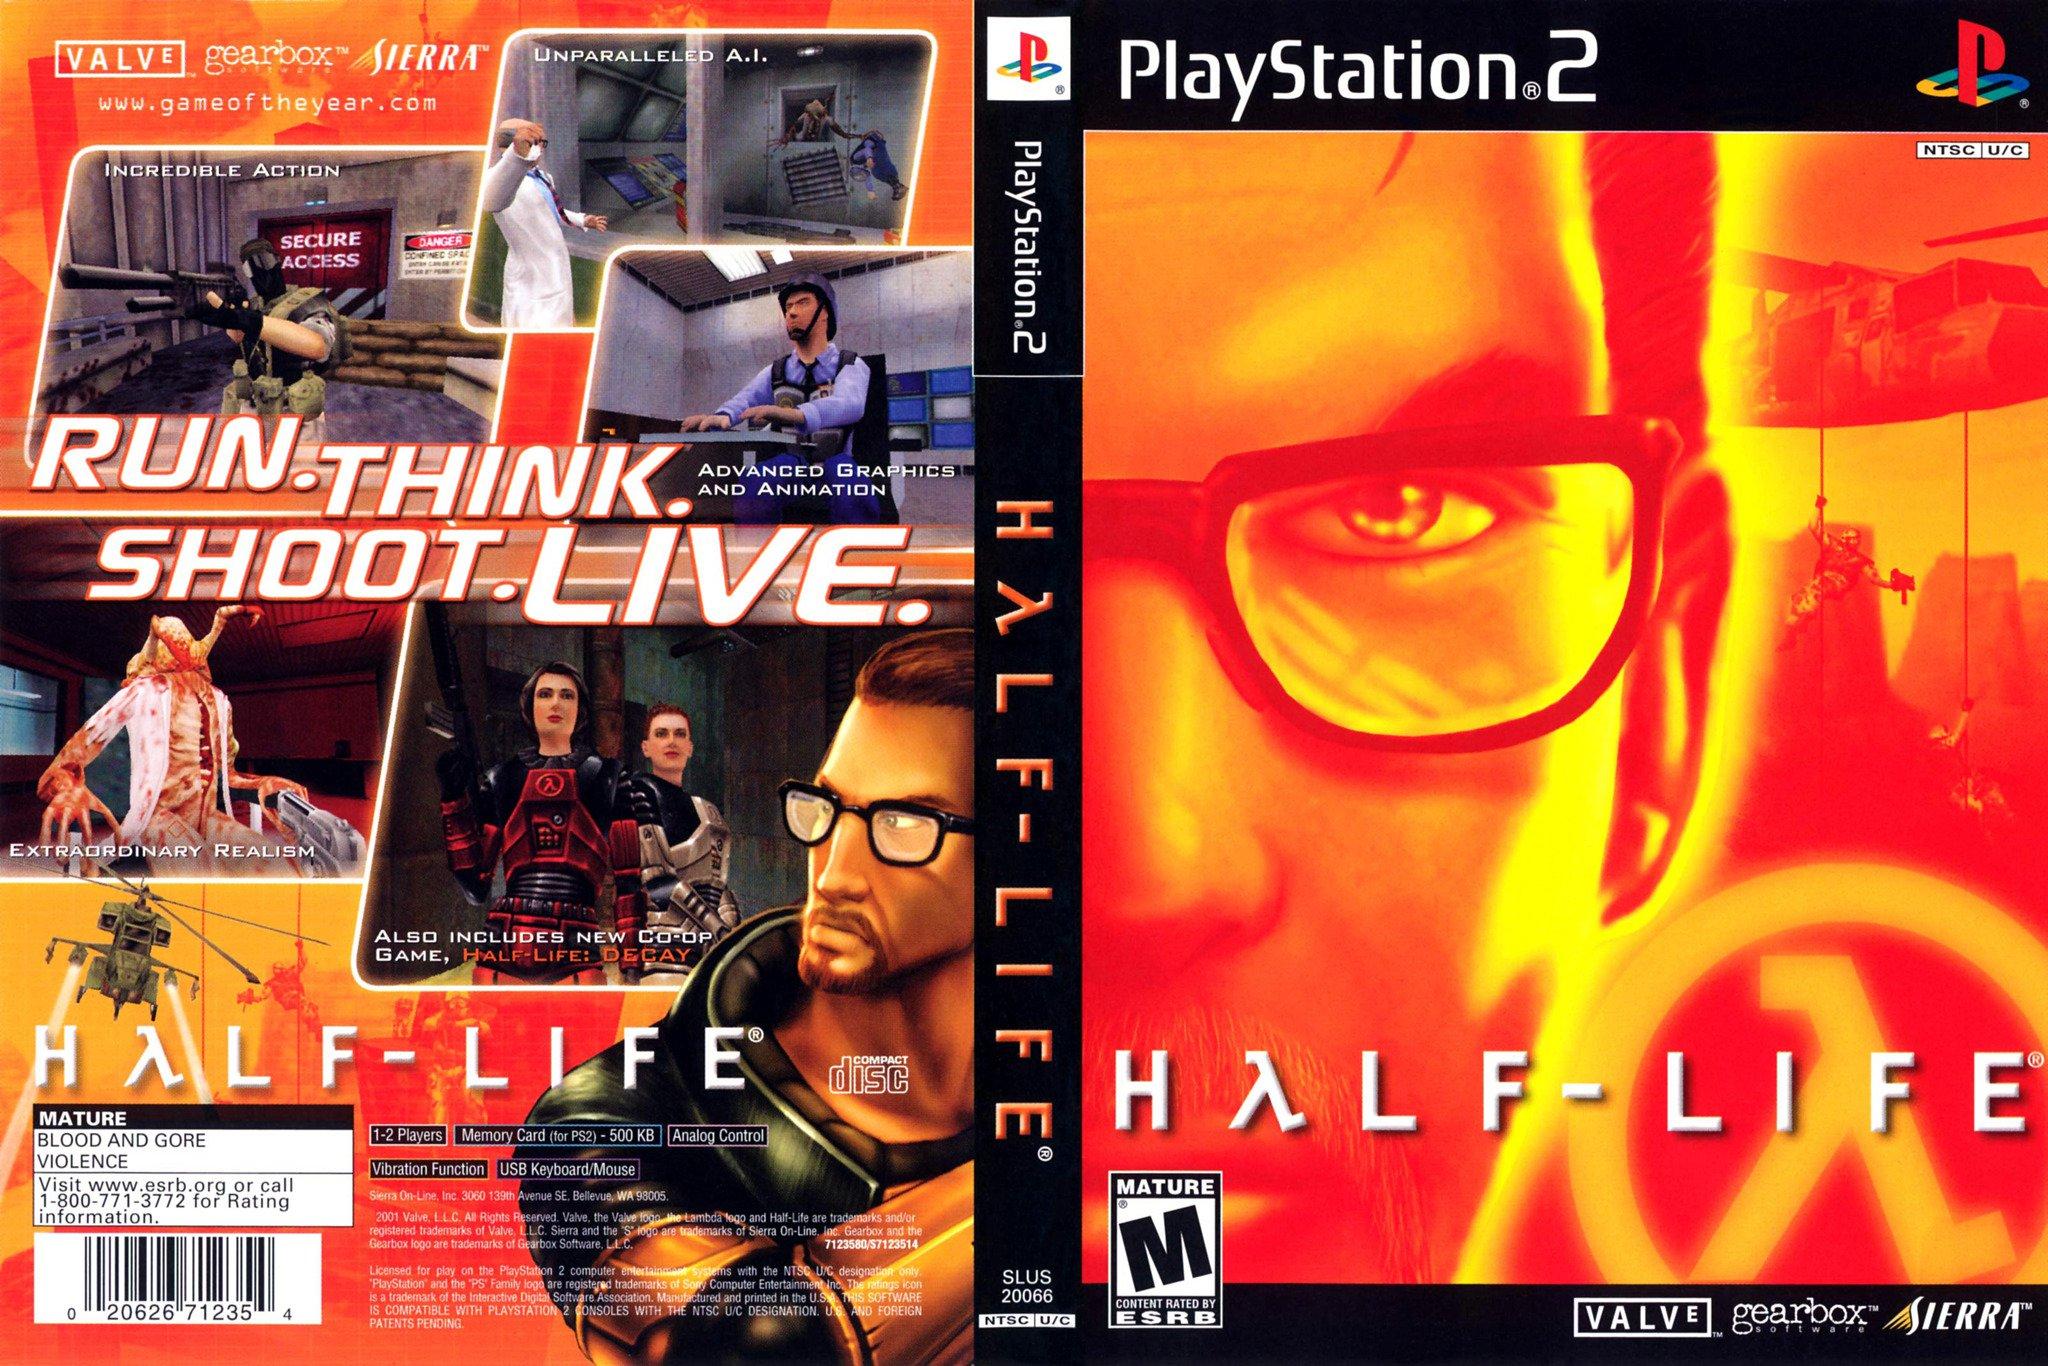 Half-Life PS2 Port 1 0 file - Mod DB